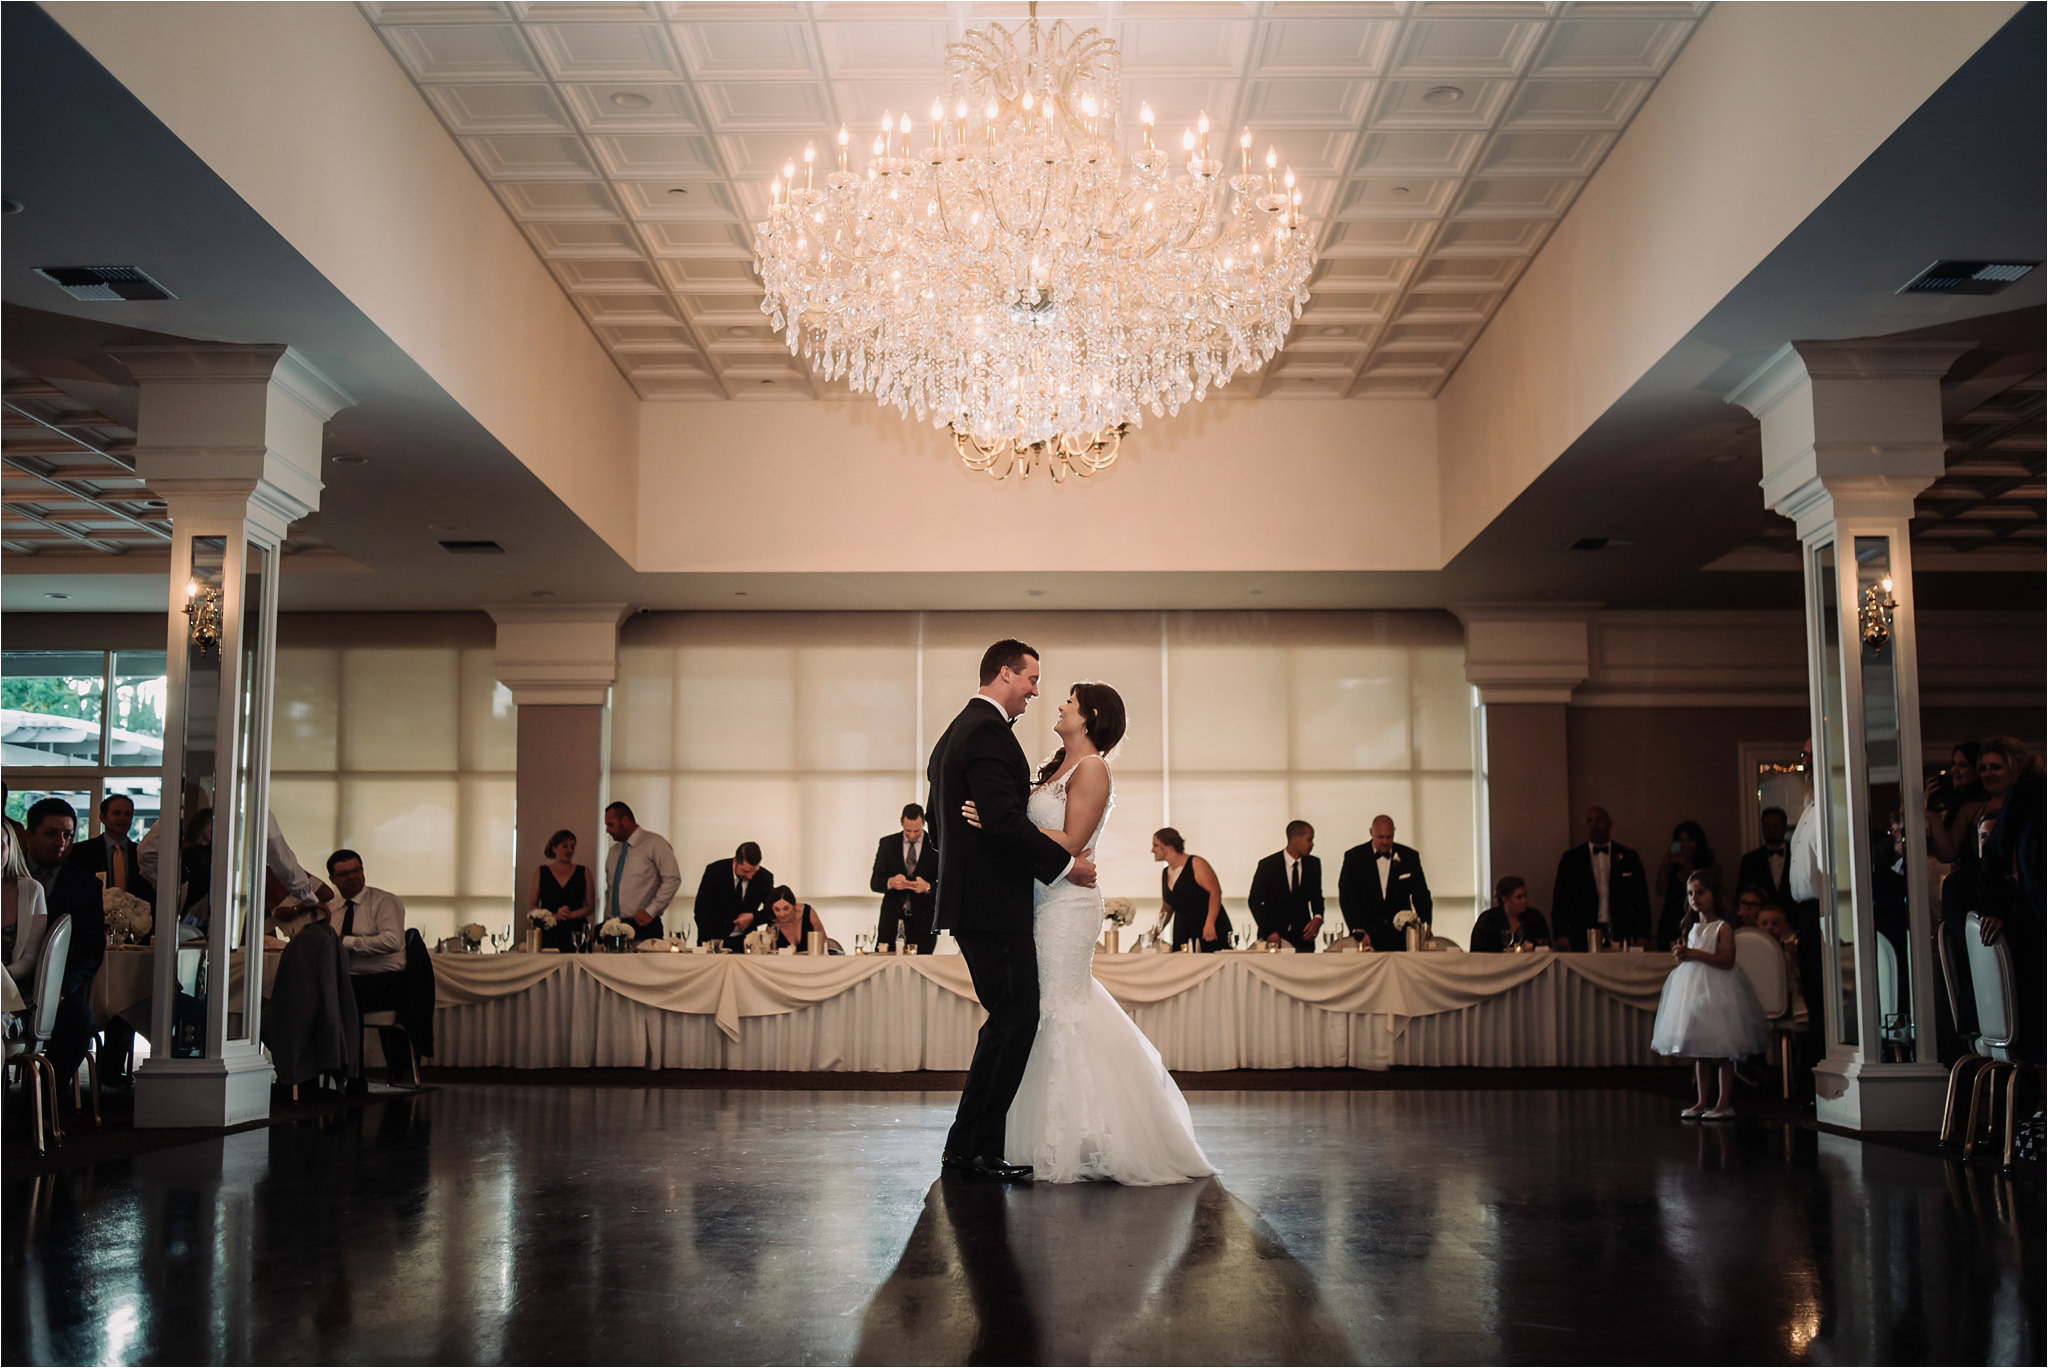 jessica-roman-photography-arden hills wedding photograpger-sacramento-boise-41.jpg